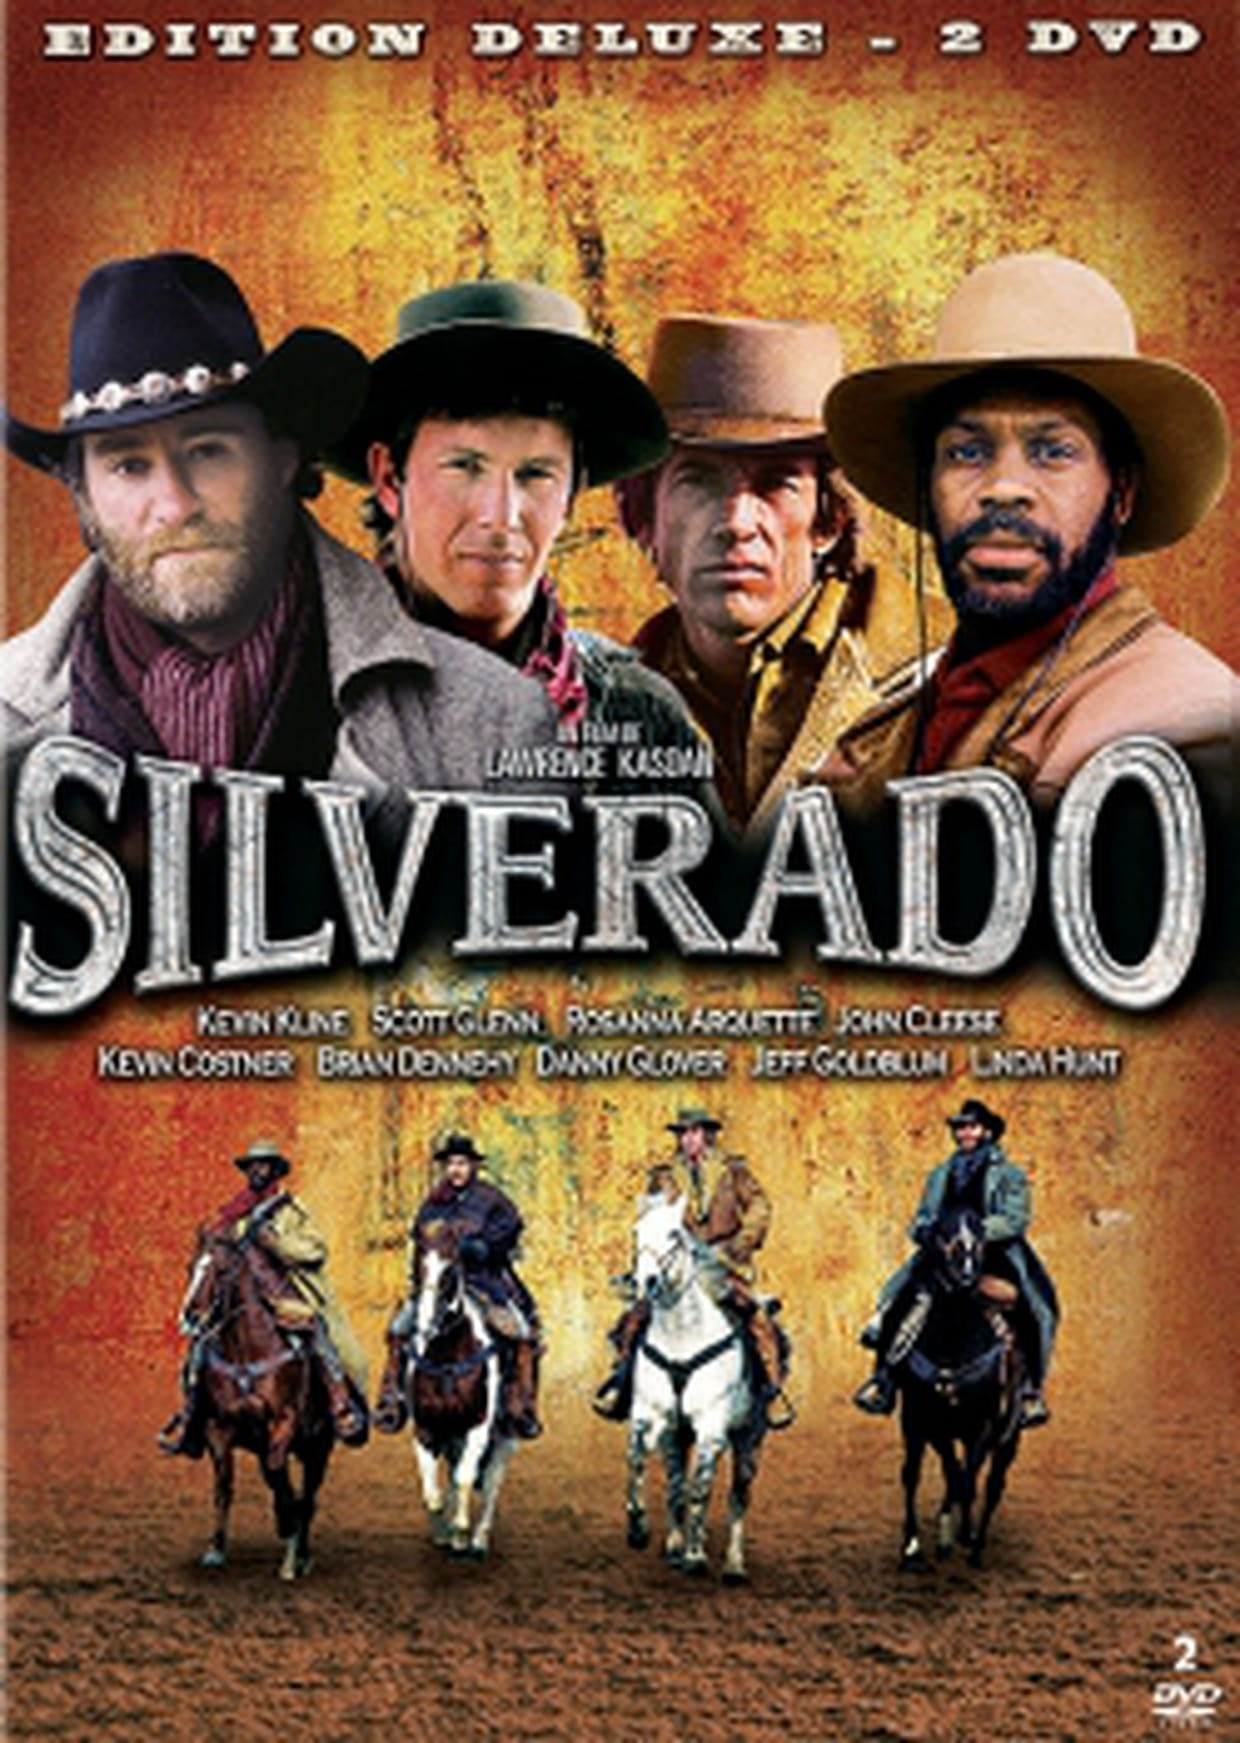 Silverado Film